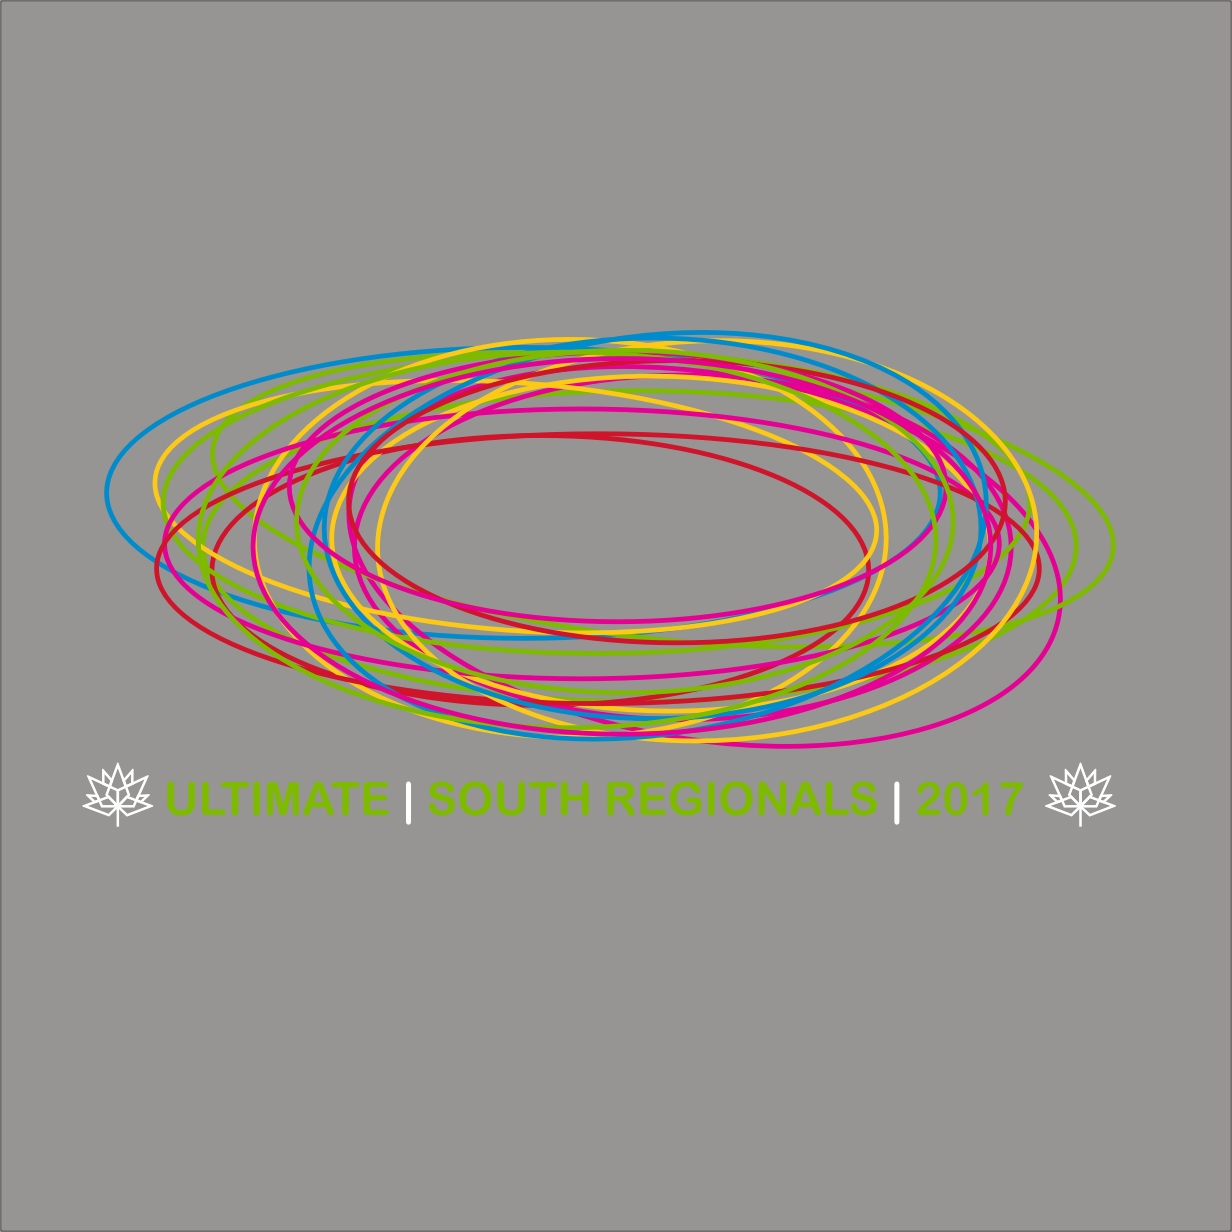 2017 Ultimate logo grey.jpg